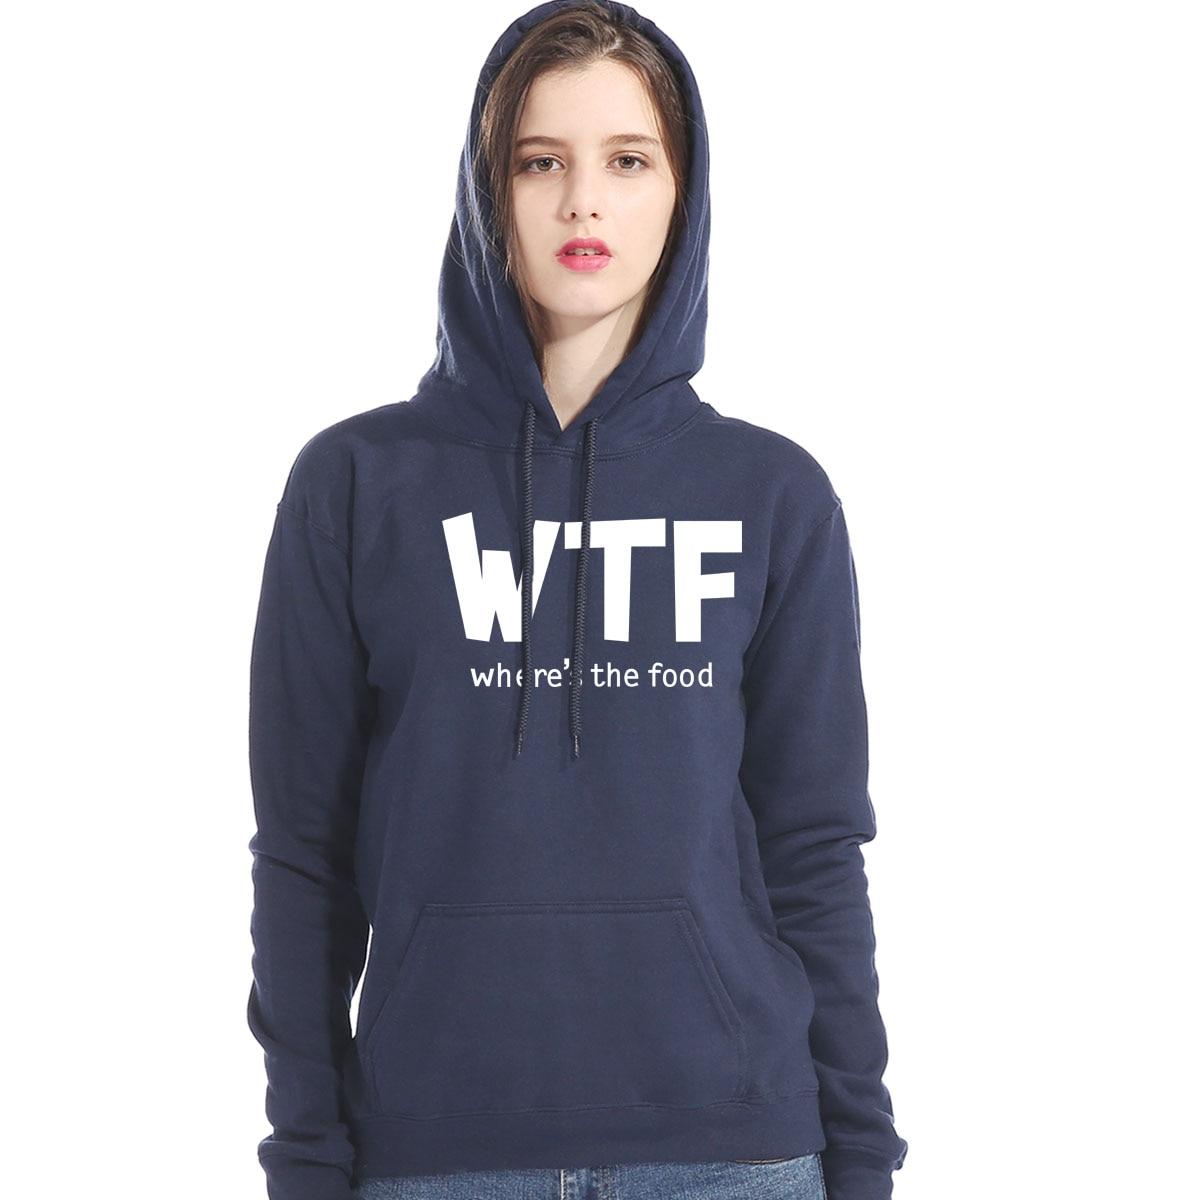 WTF WHERE'S THE FOOD Letter Print Women's Hoodies 2019 Autumn Long Sleeve Pullover Hoody Harajuku Female Sportwear Sweatshirts